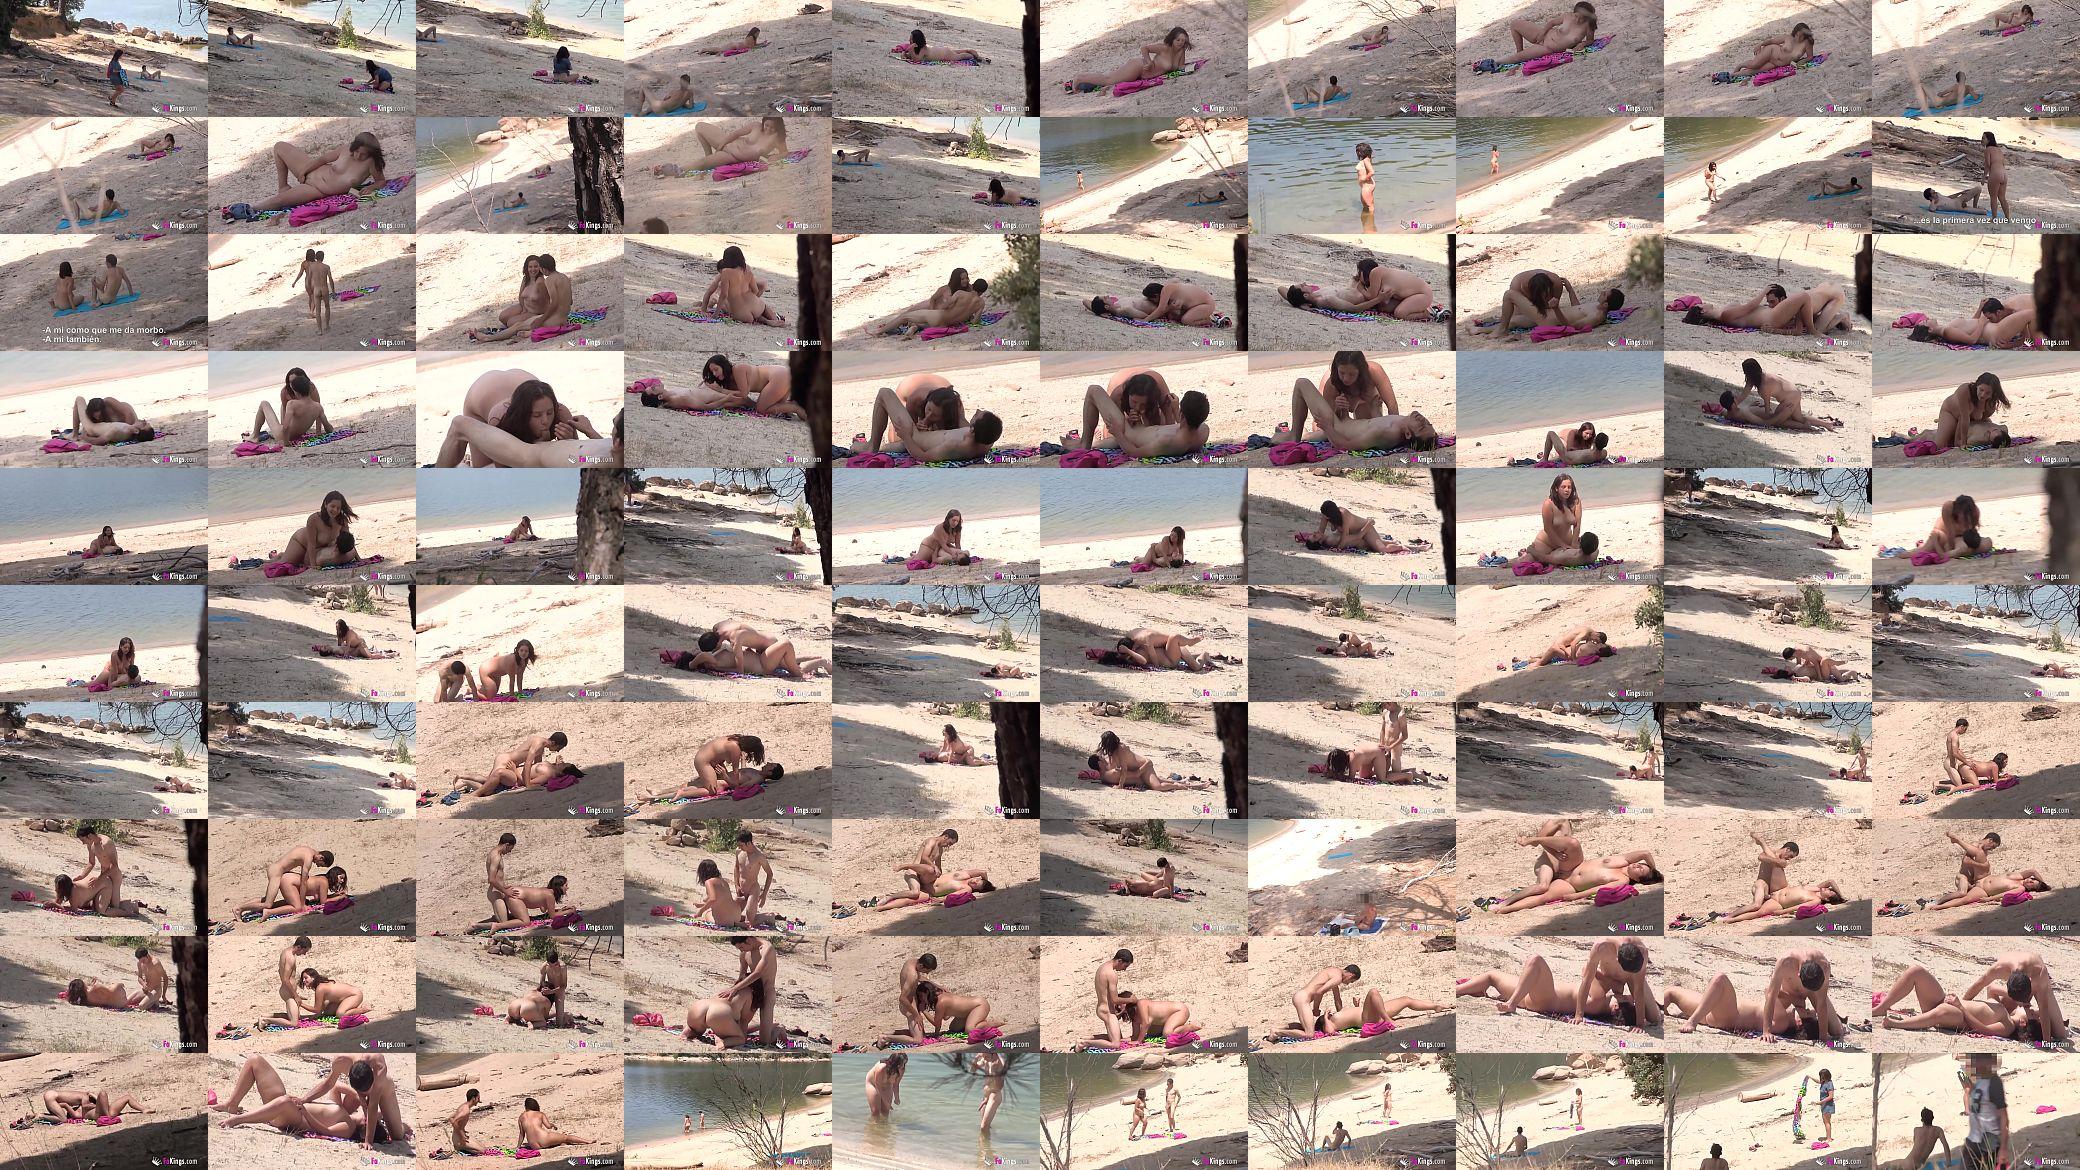 Araceli Playa Porno Iputas voyeur and nudism session with alba and a stranger - xnxx